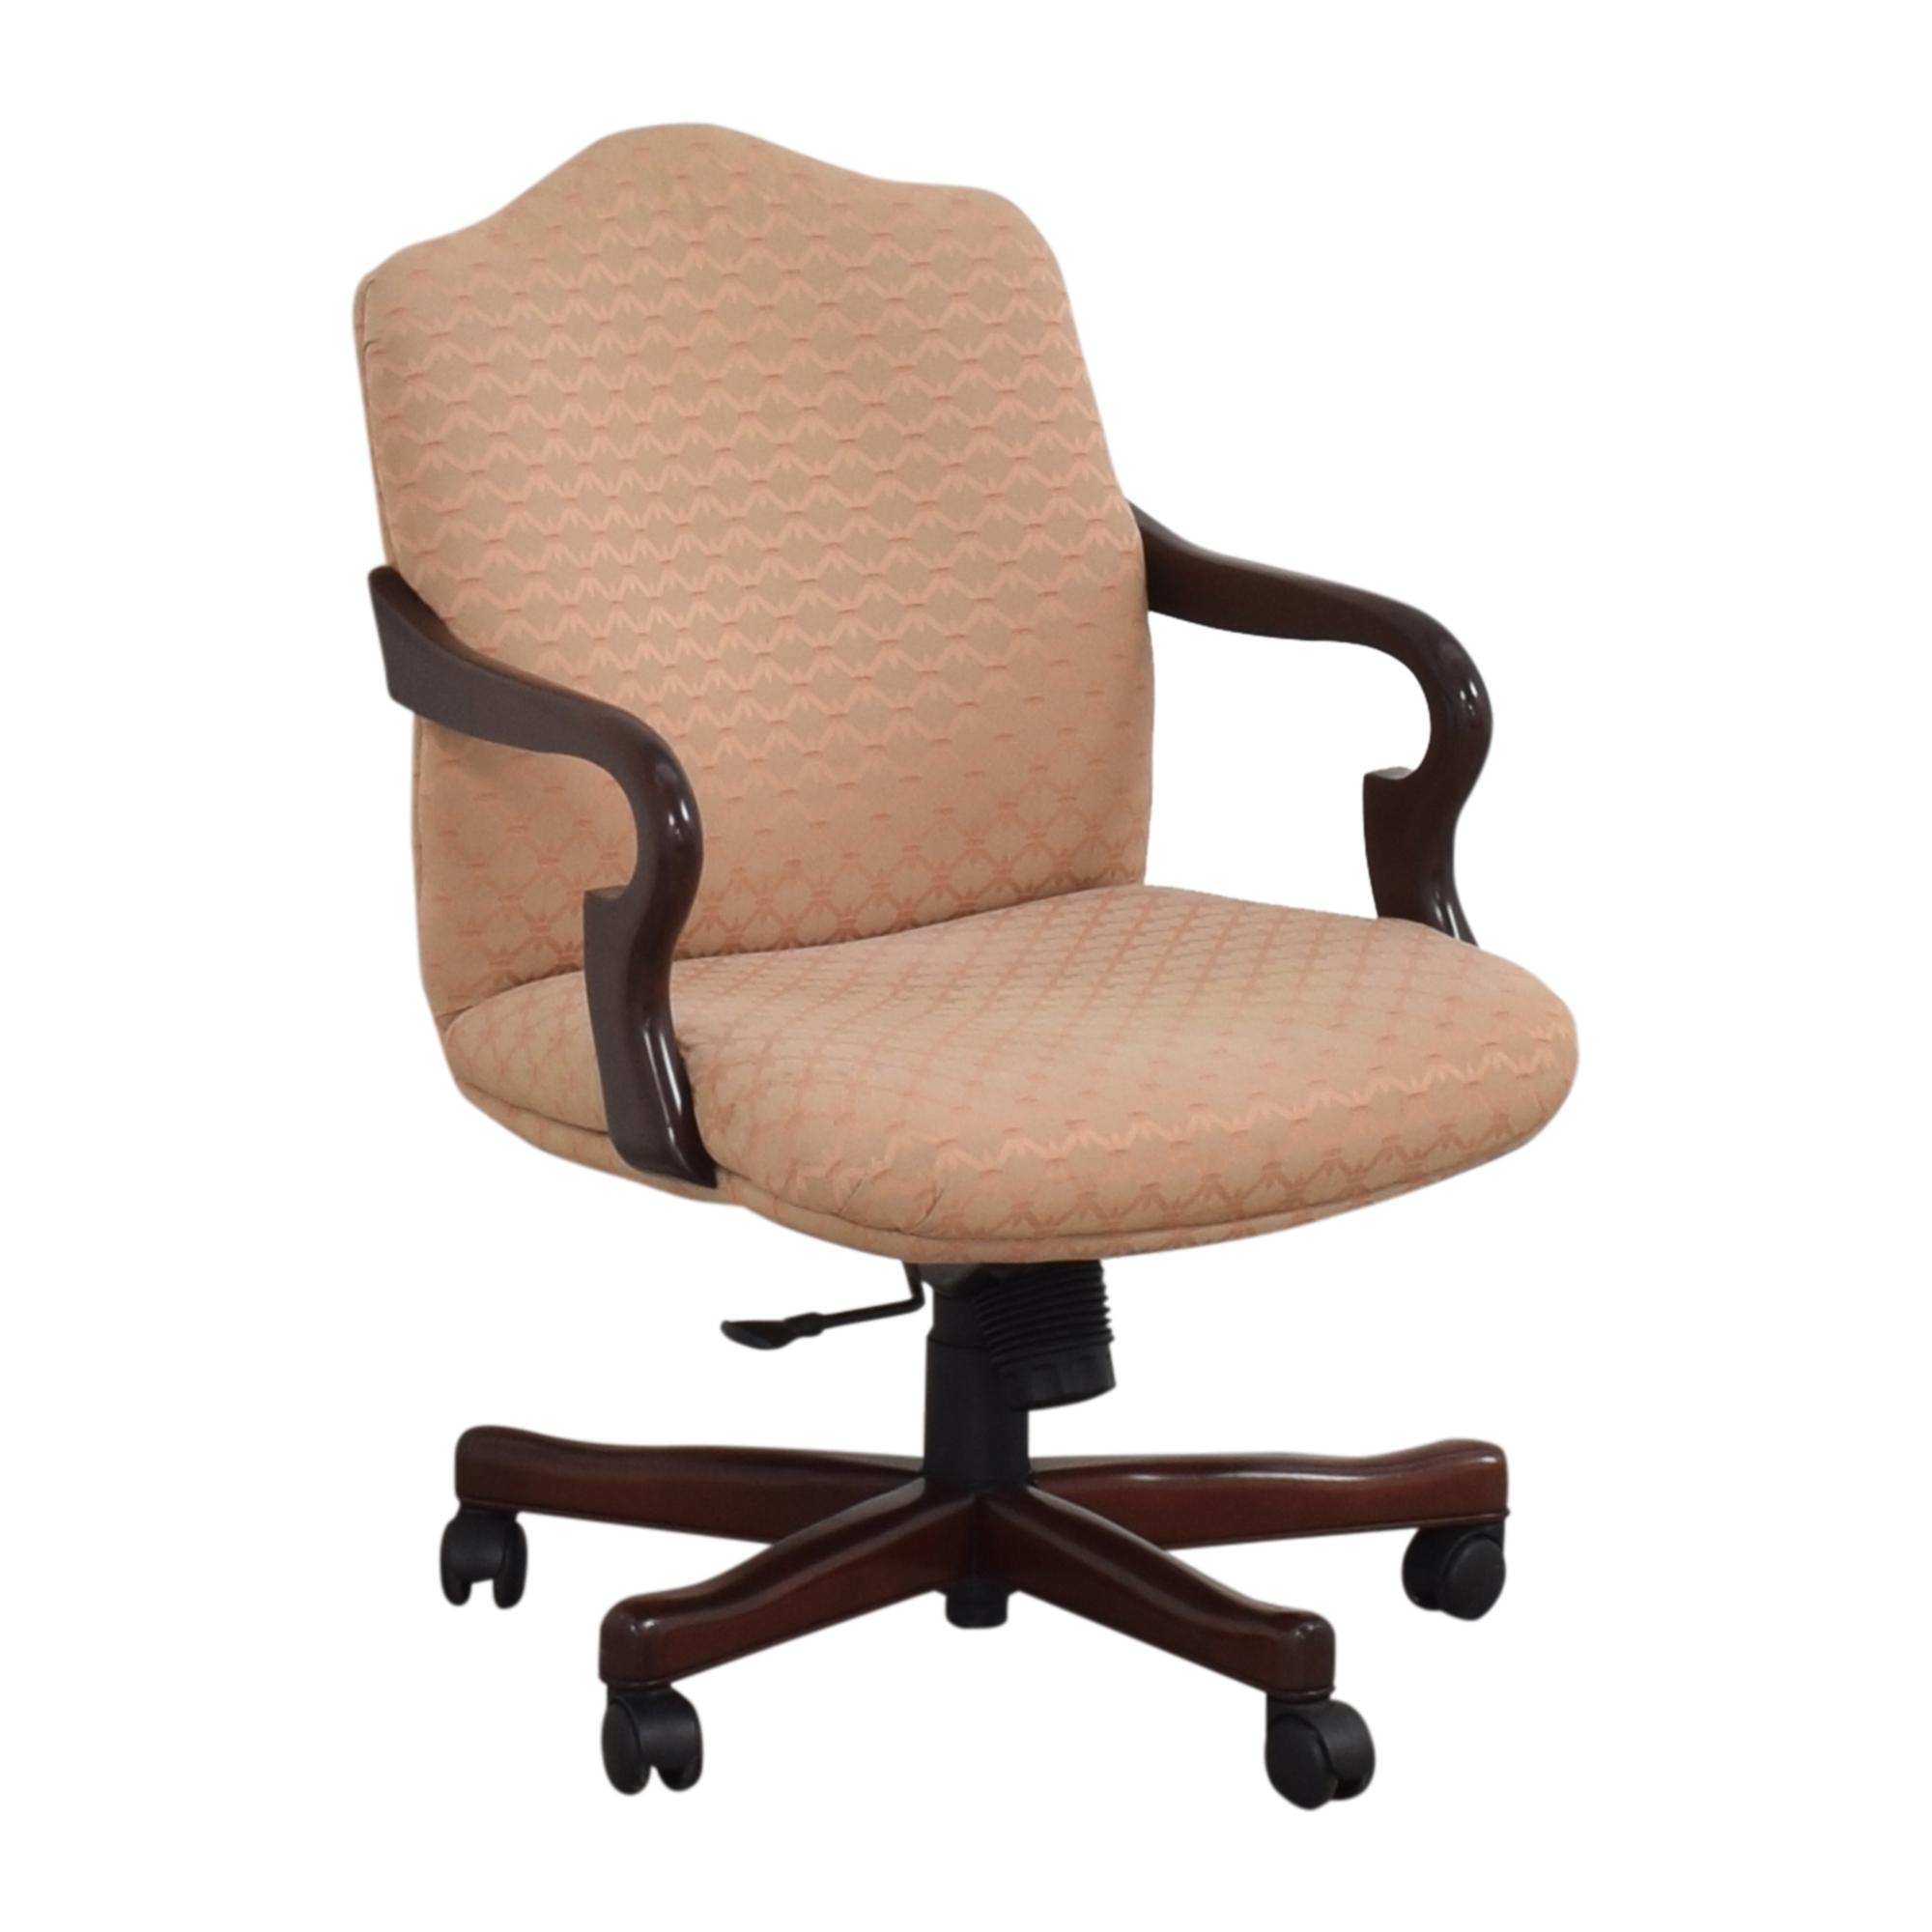 Jofco Swivel Tilt Office Chair Jofco